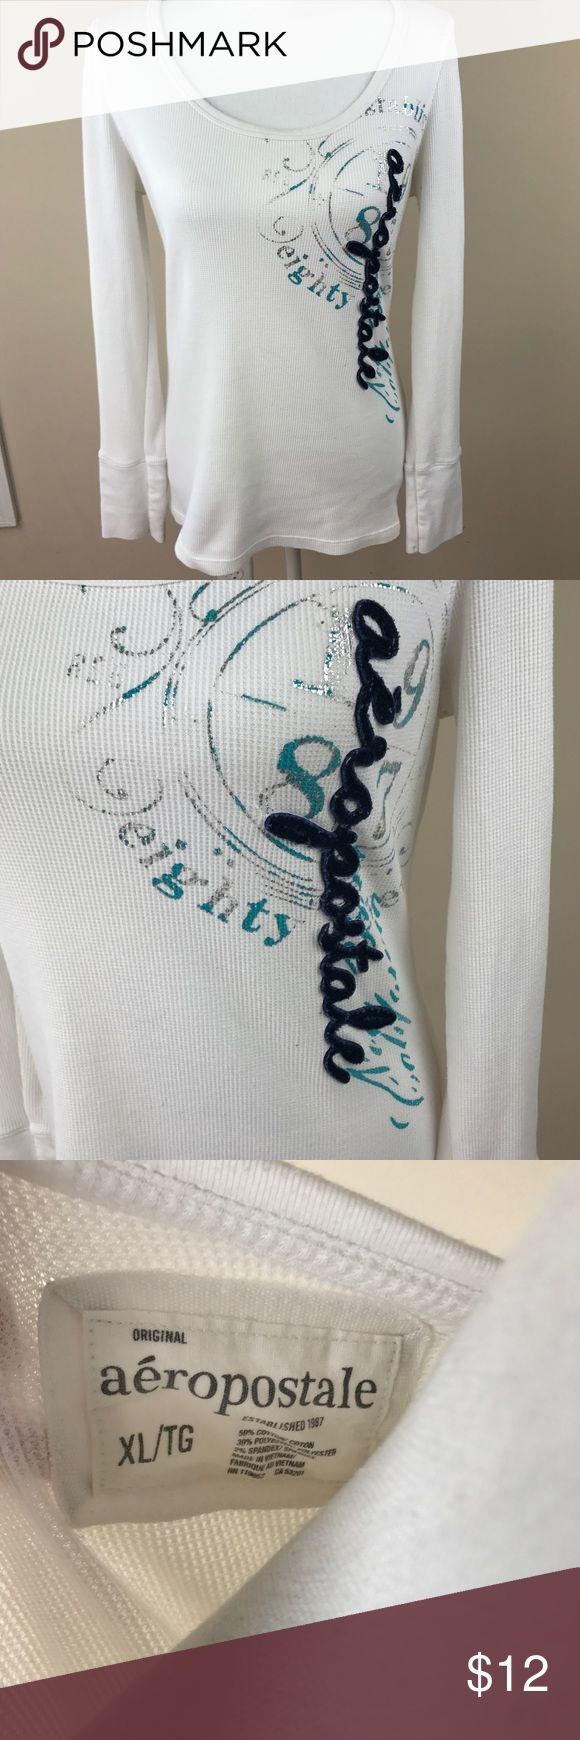 Women's Aeropostale Long Sleeve Ribbed Shirt sz XL Women's Aeropostale Long Sleeve Ribbed Shirt sz XL Aeropostale Tops Tees - Long Sleeve